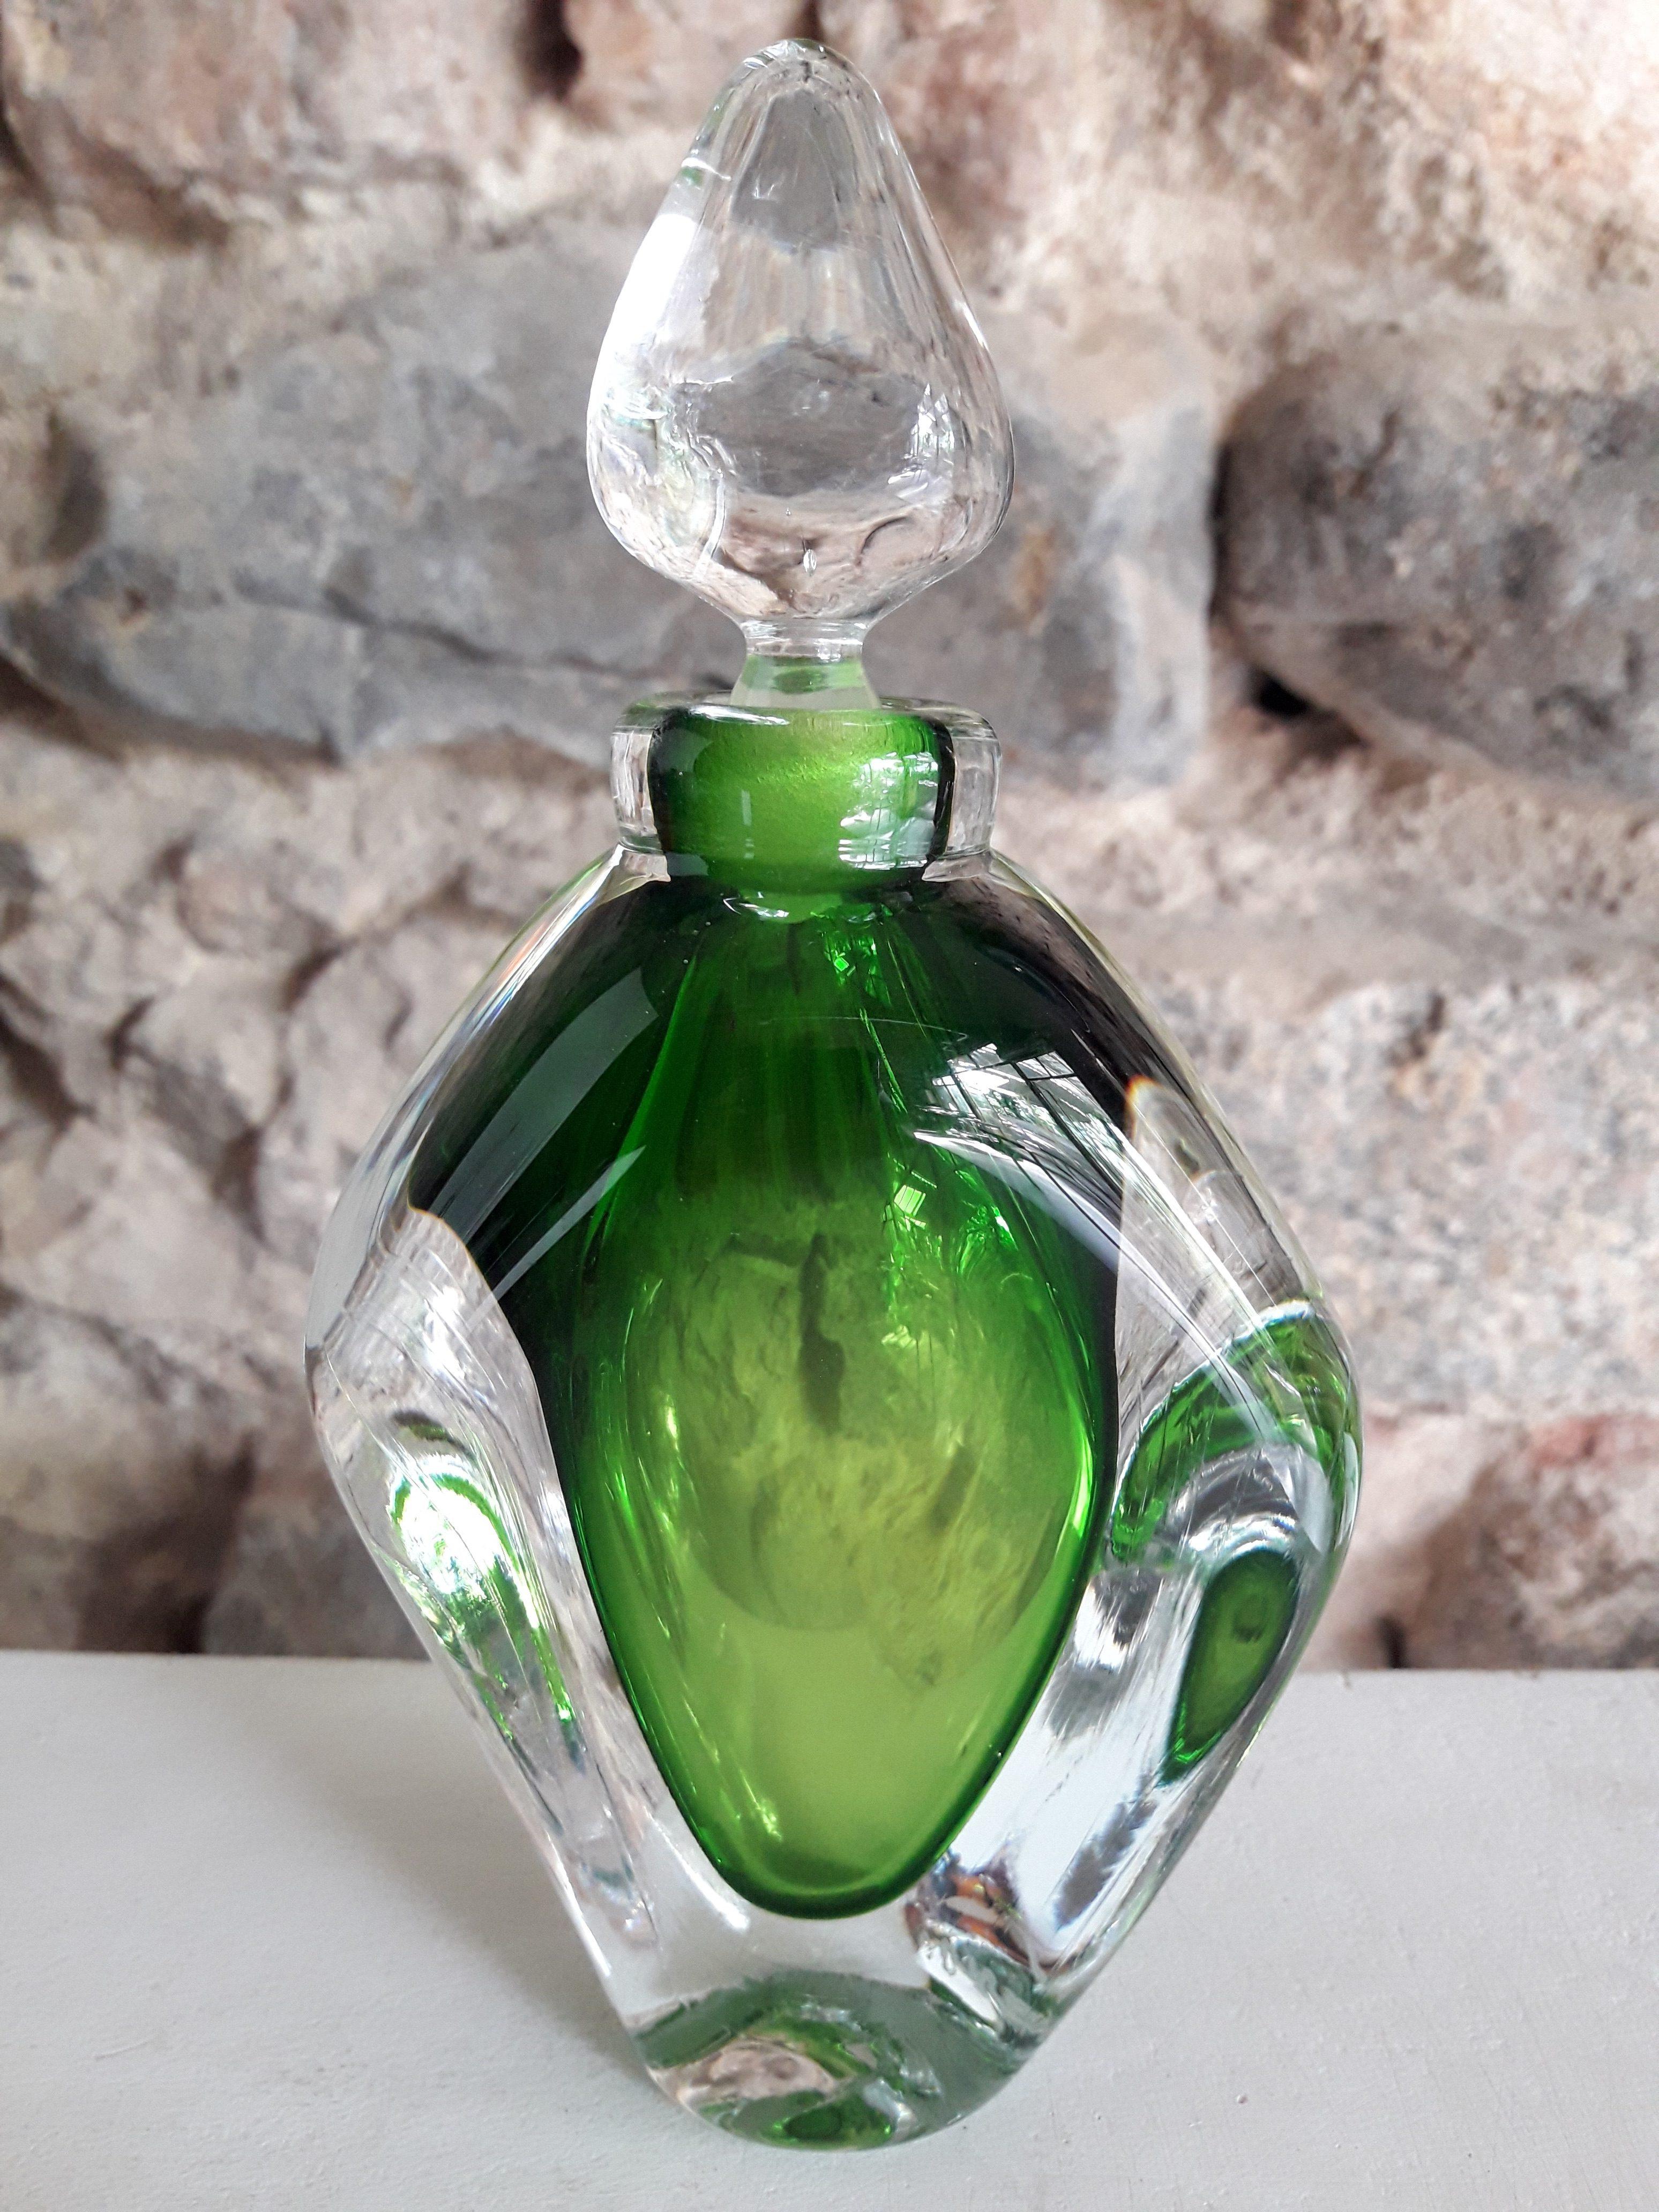 pierre-marion-verre-exposition-jaboulet-tain-hermitage